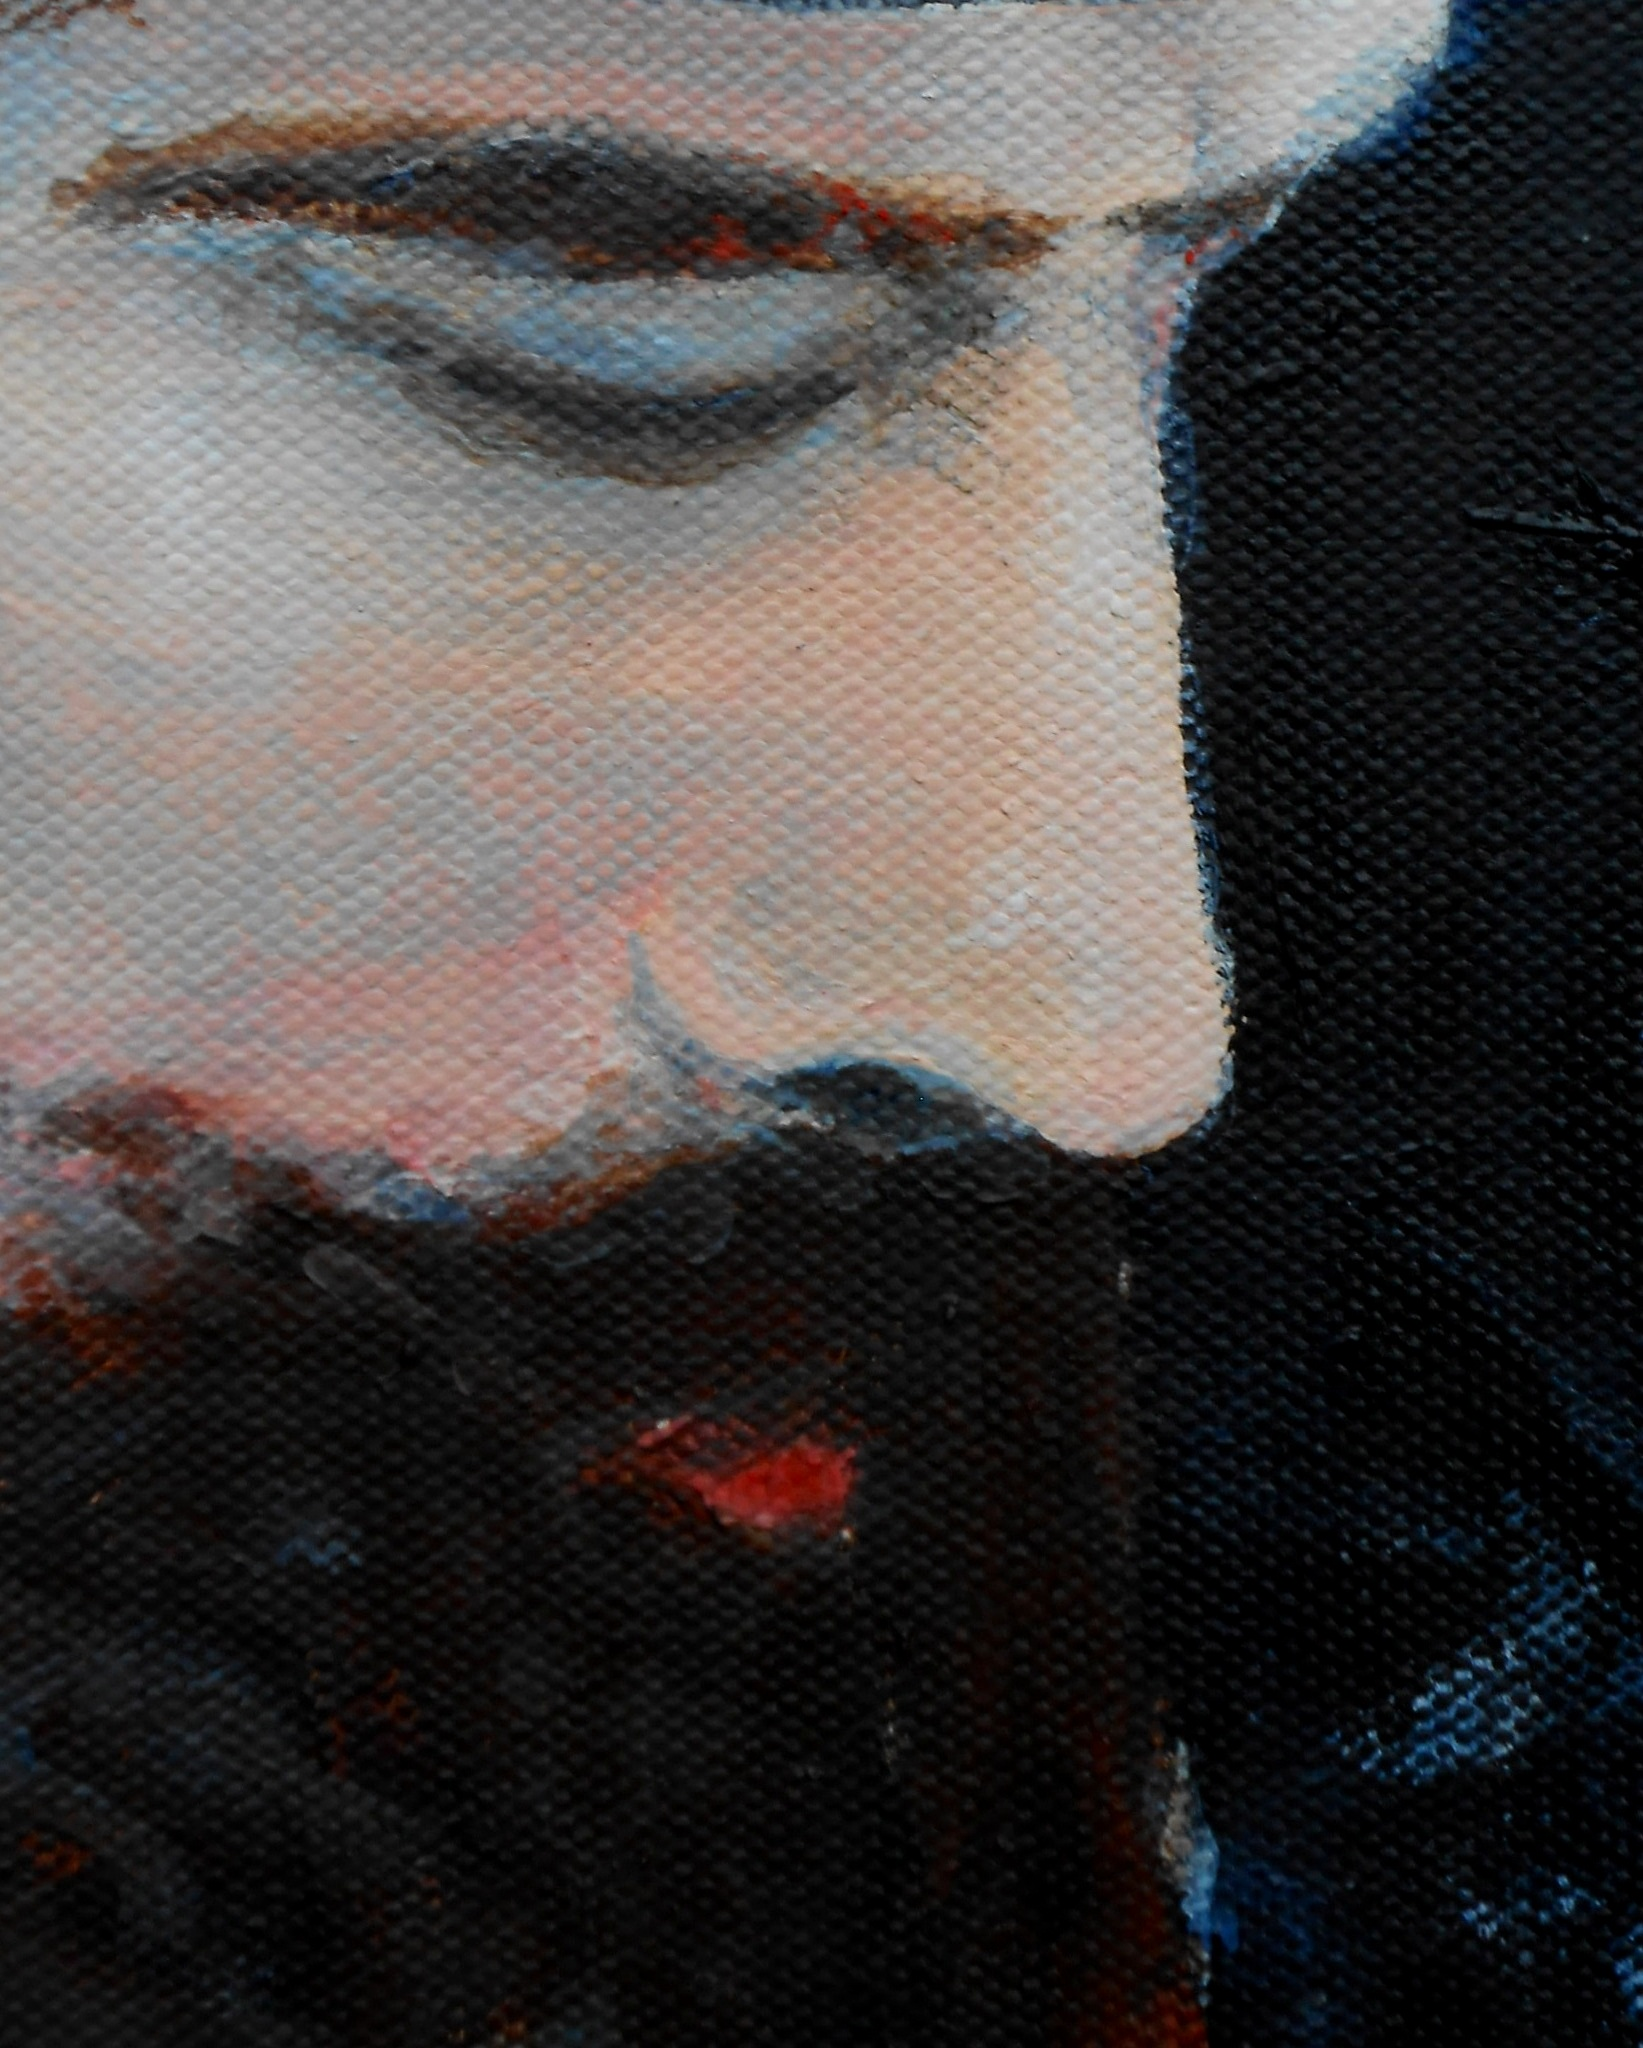 Hasid 9x12 August 2014 (detail 1).JPG